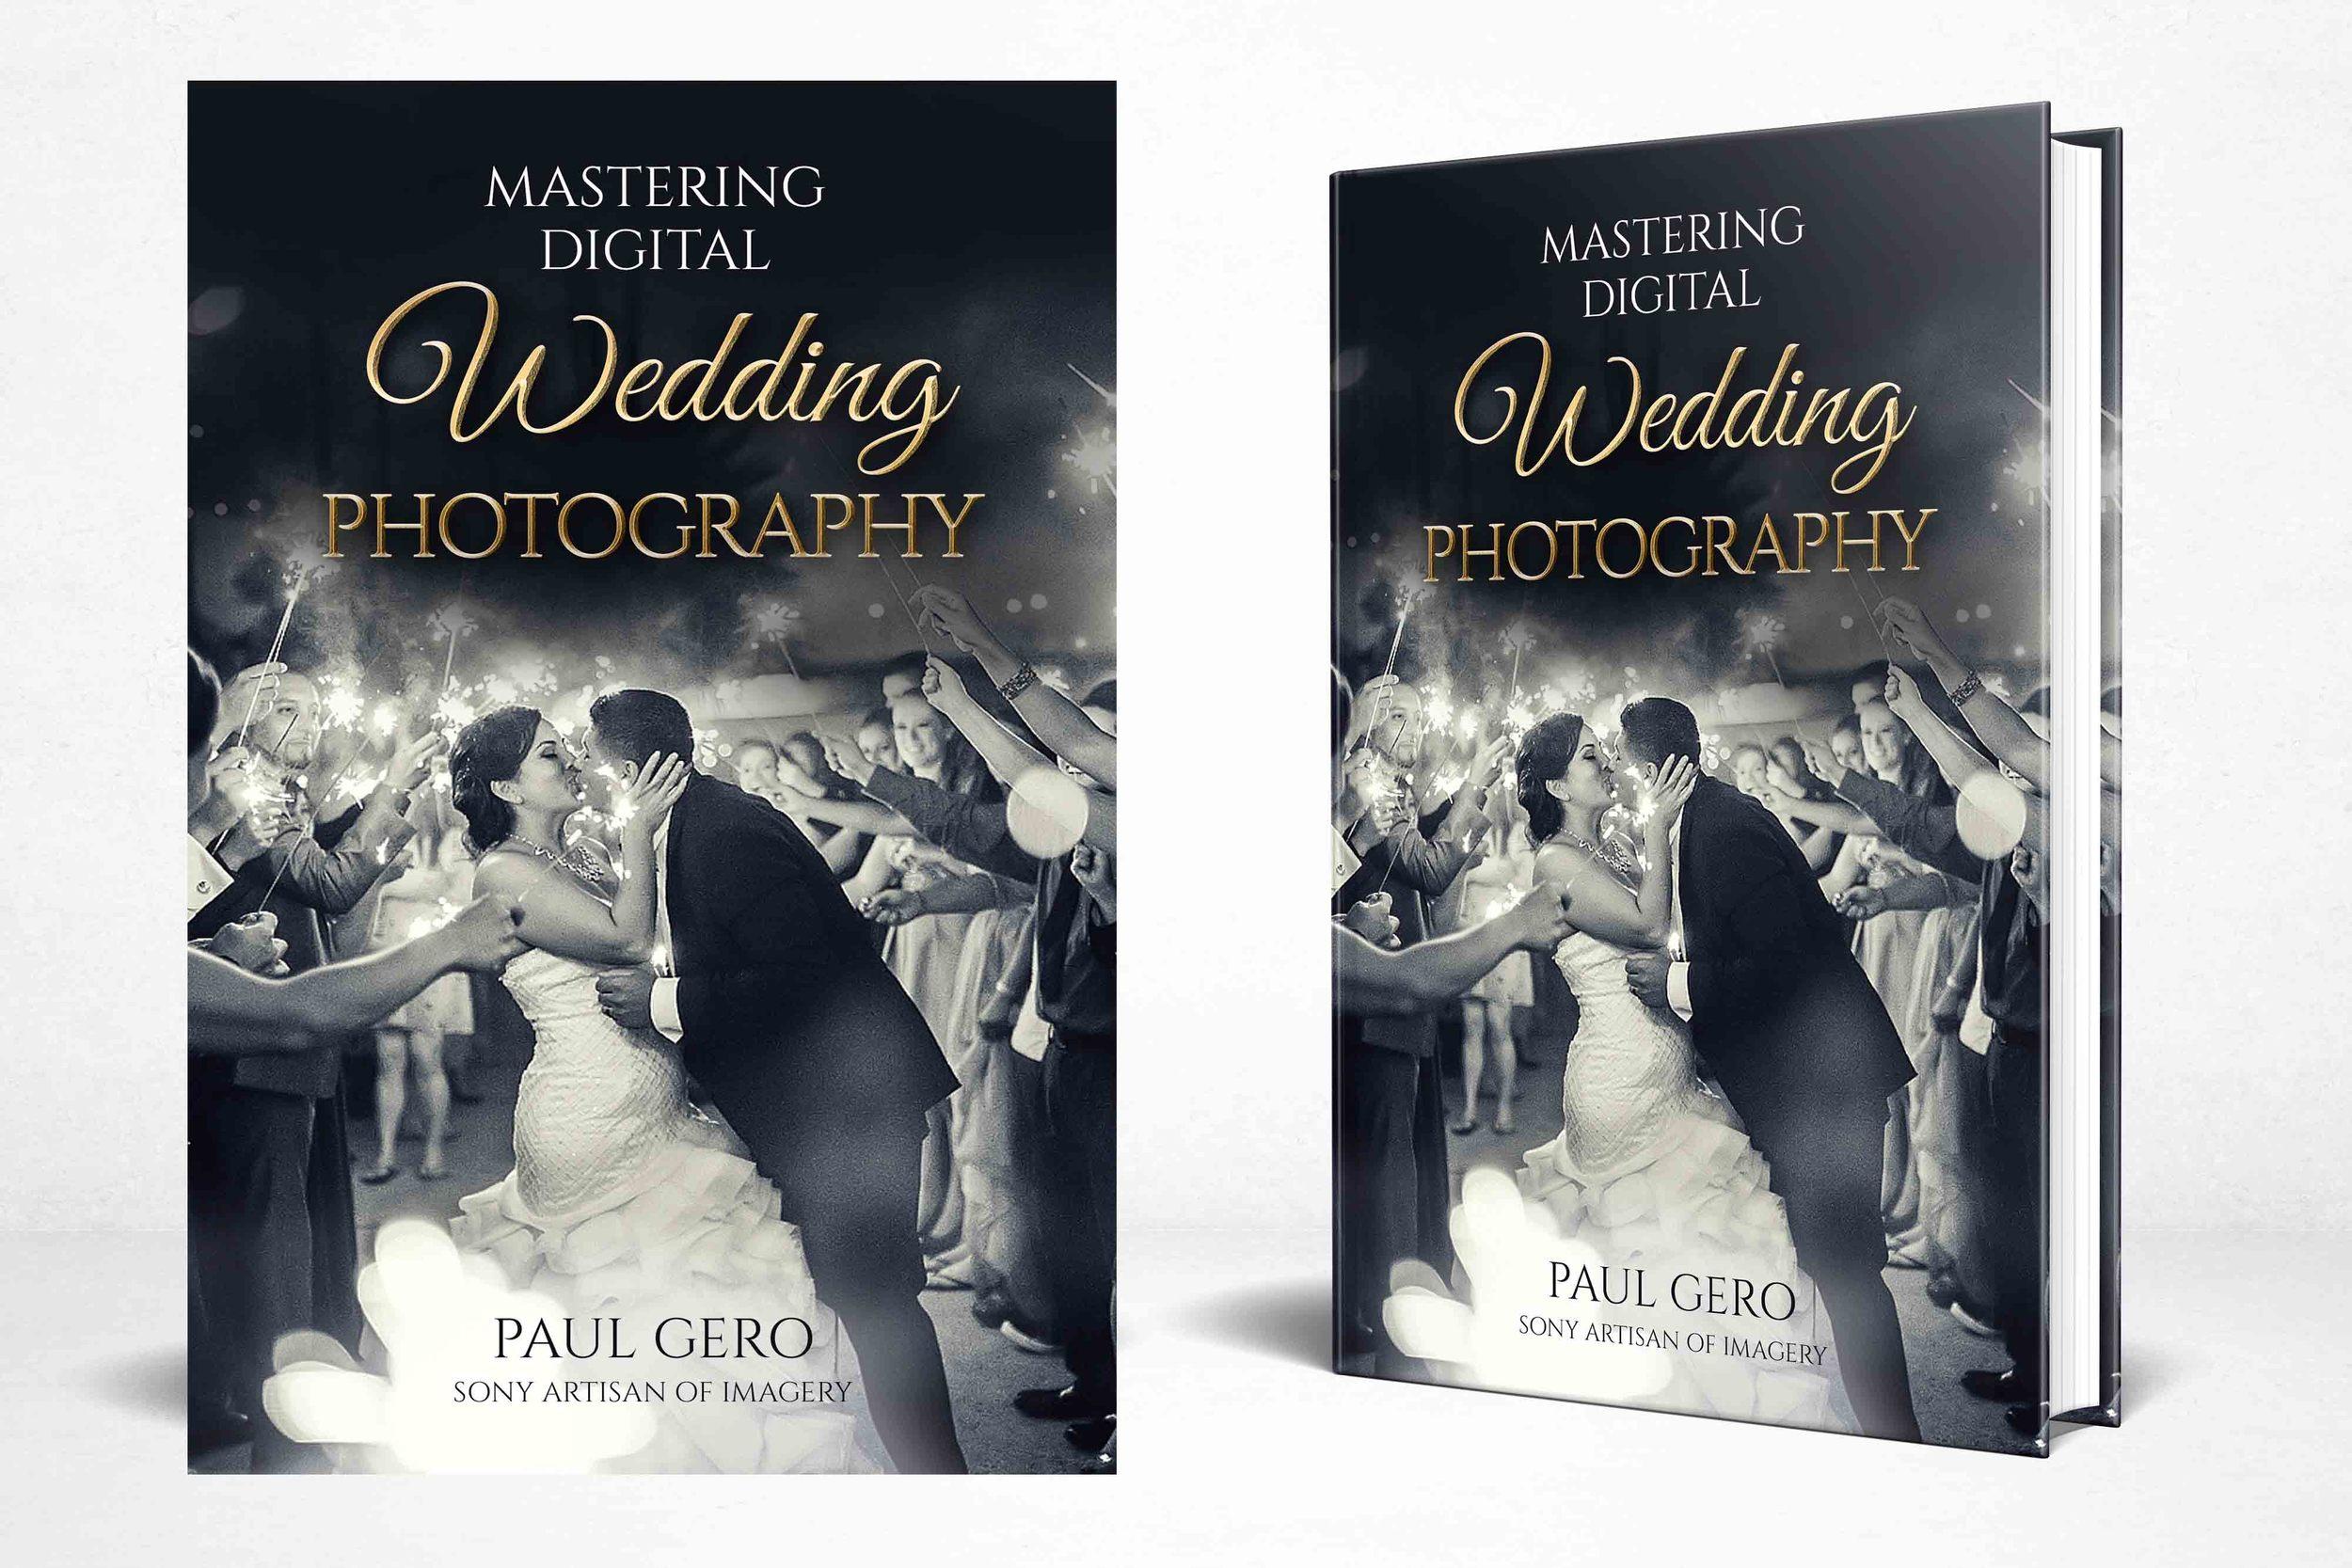 Mastering Digital Wedding Photography_by Sony Artisan Paul Gero